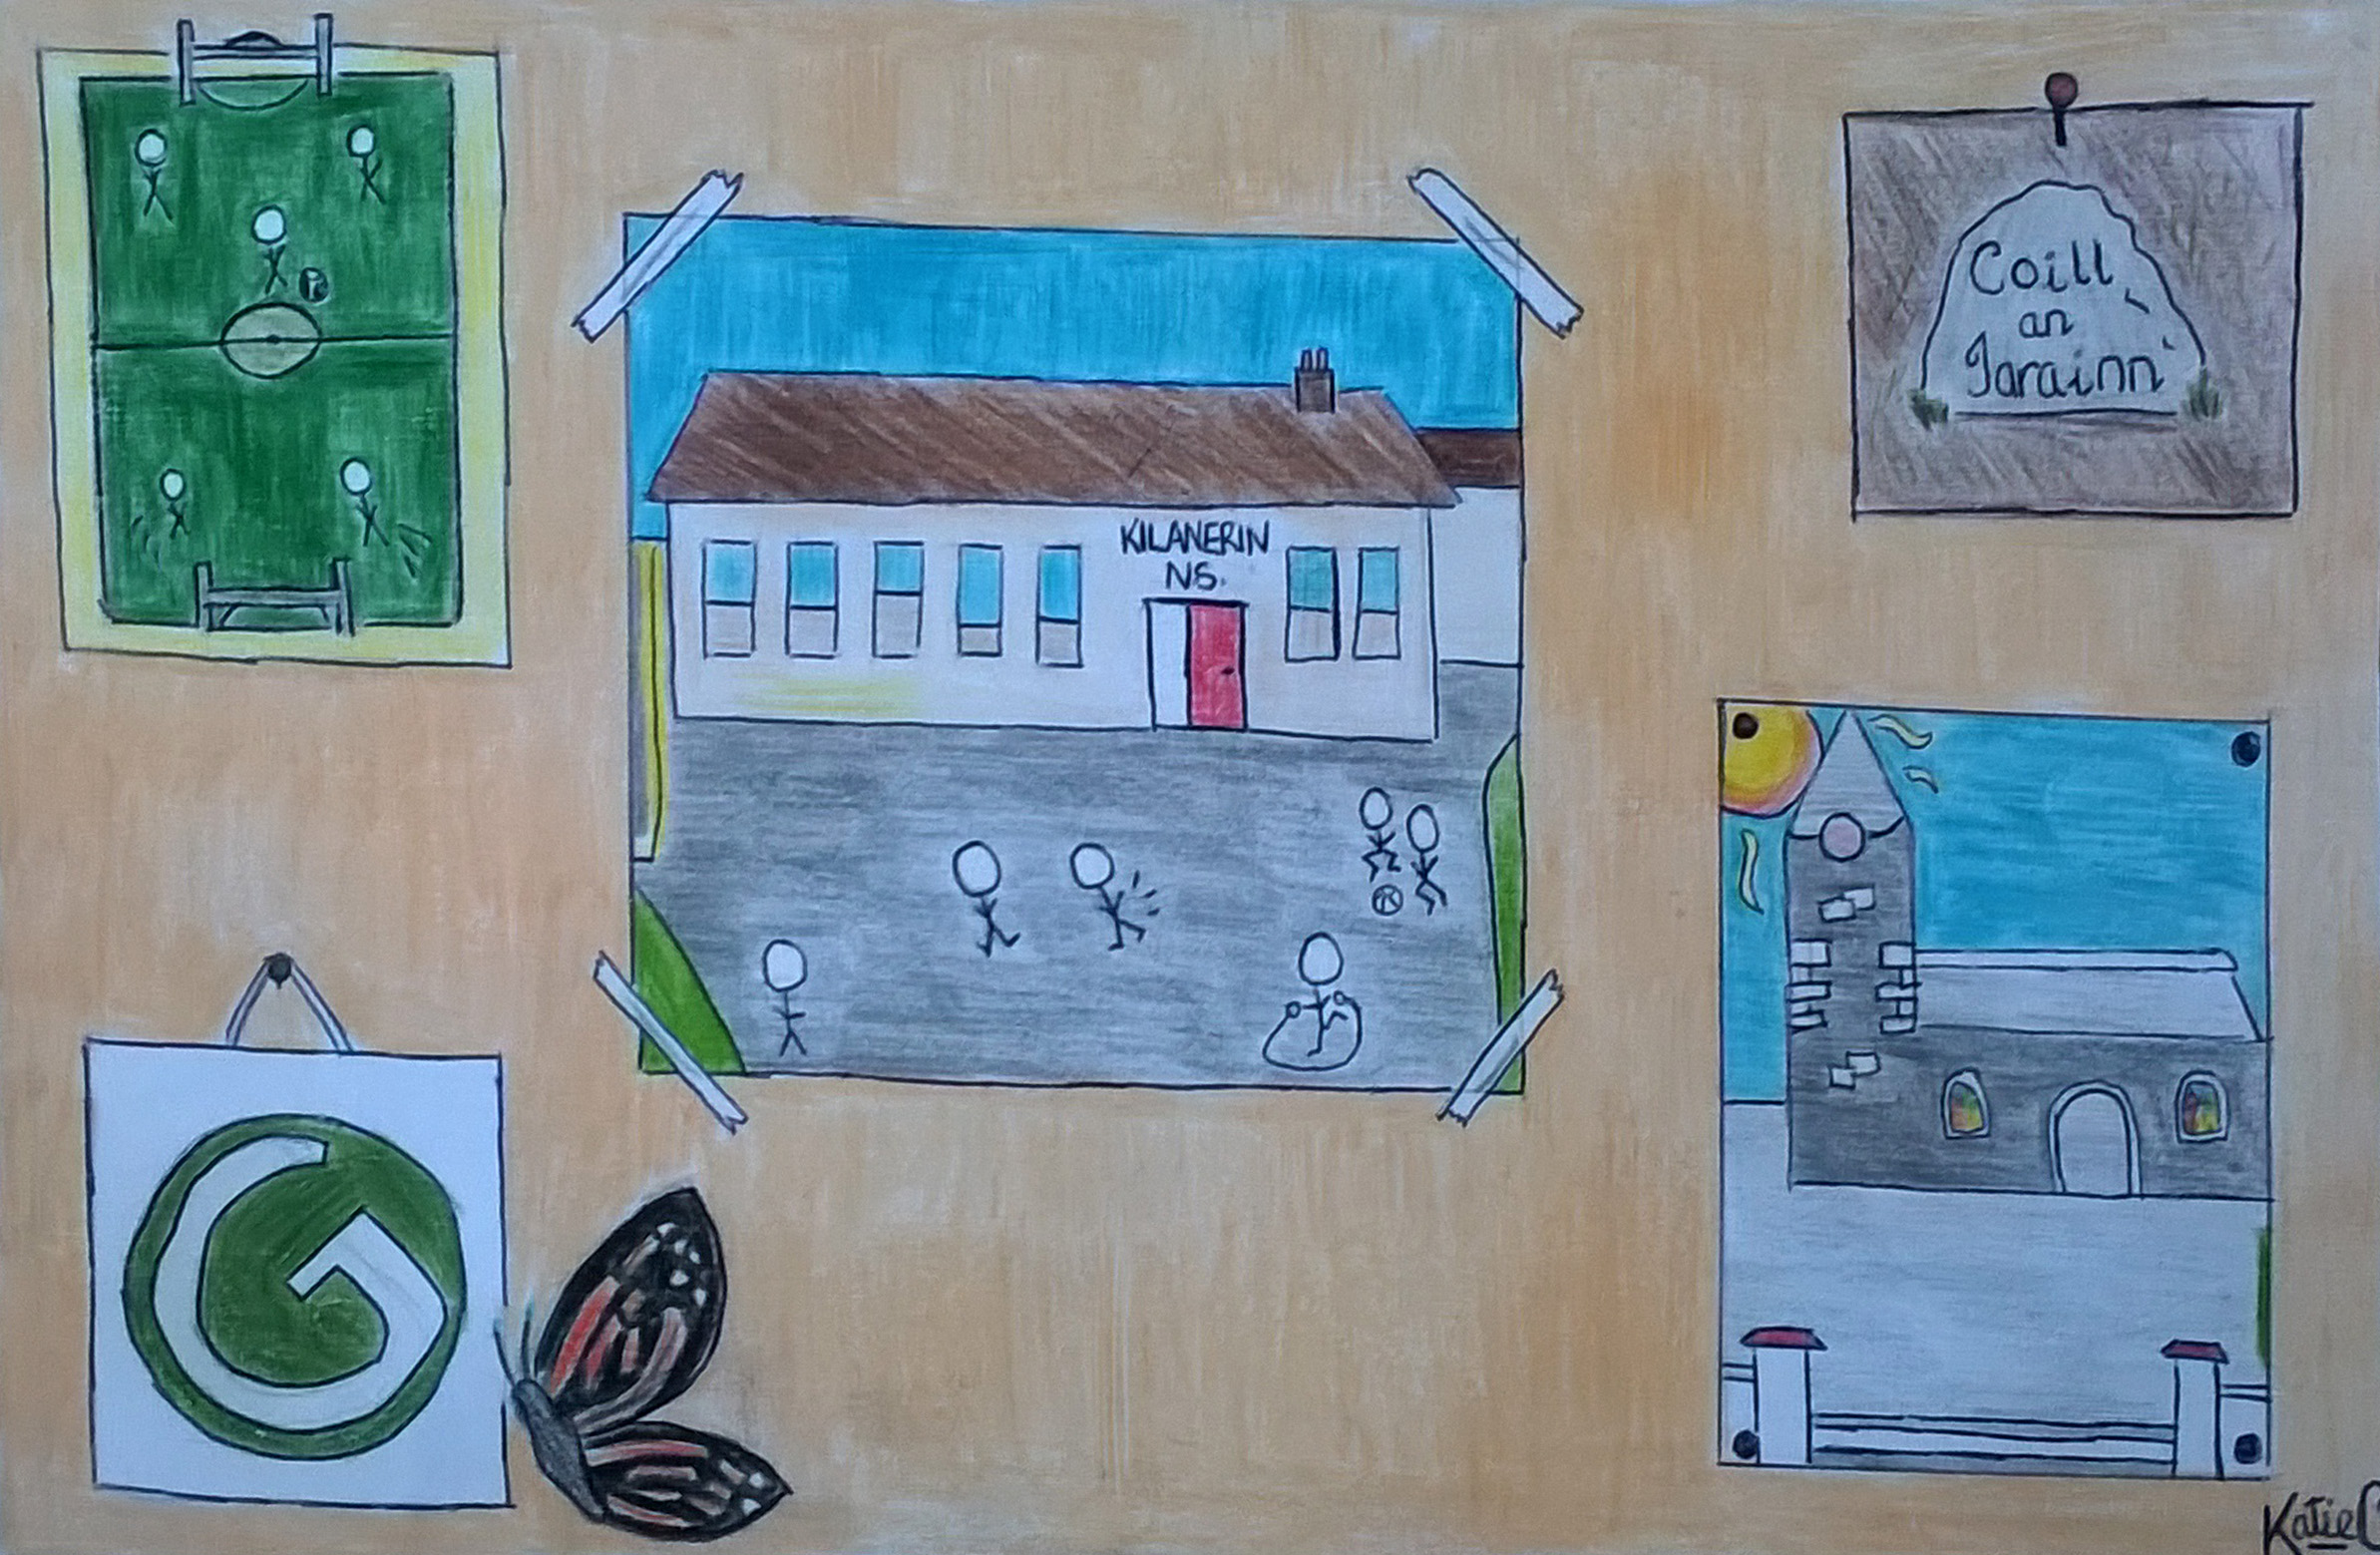 August-Kilanerin-School